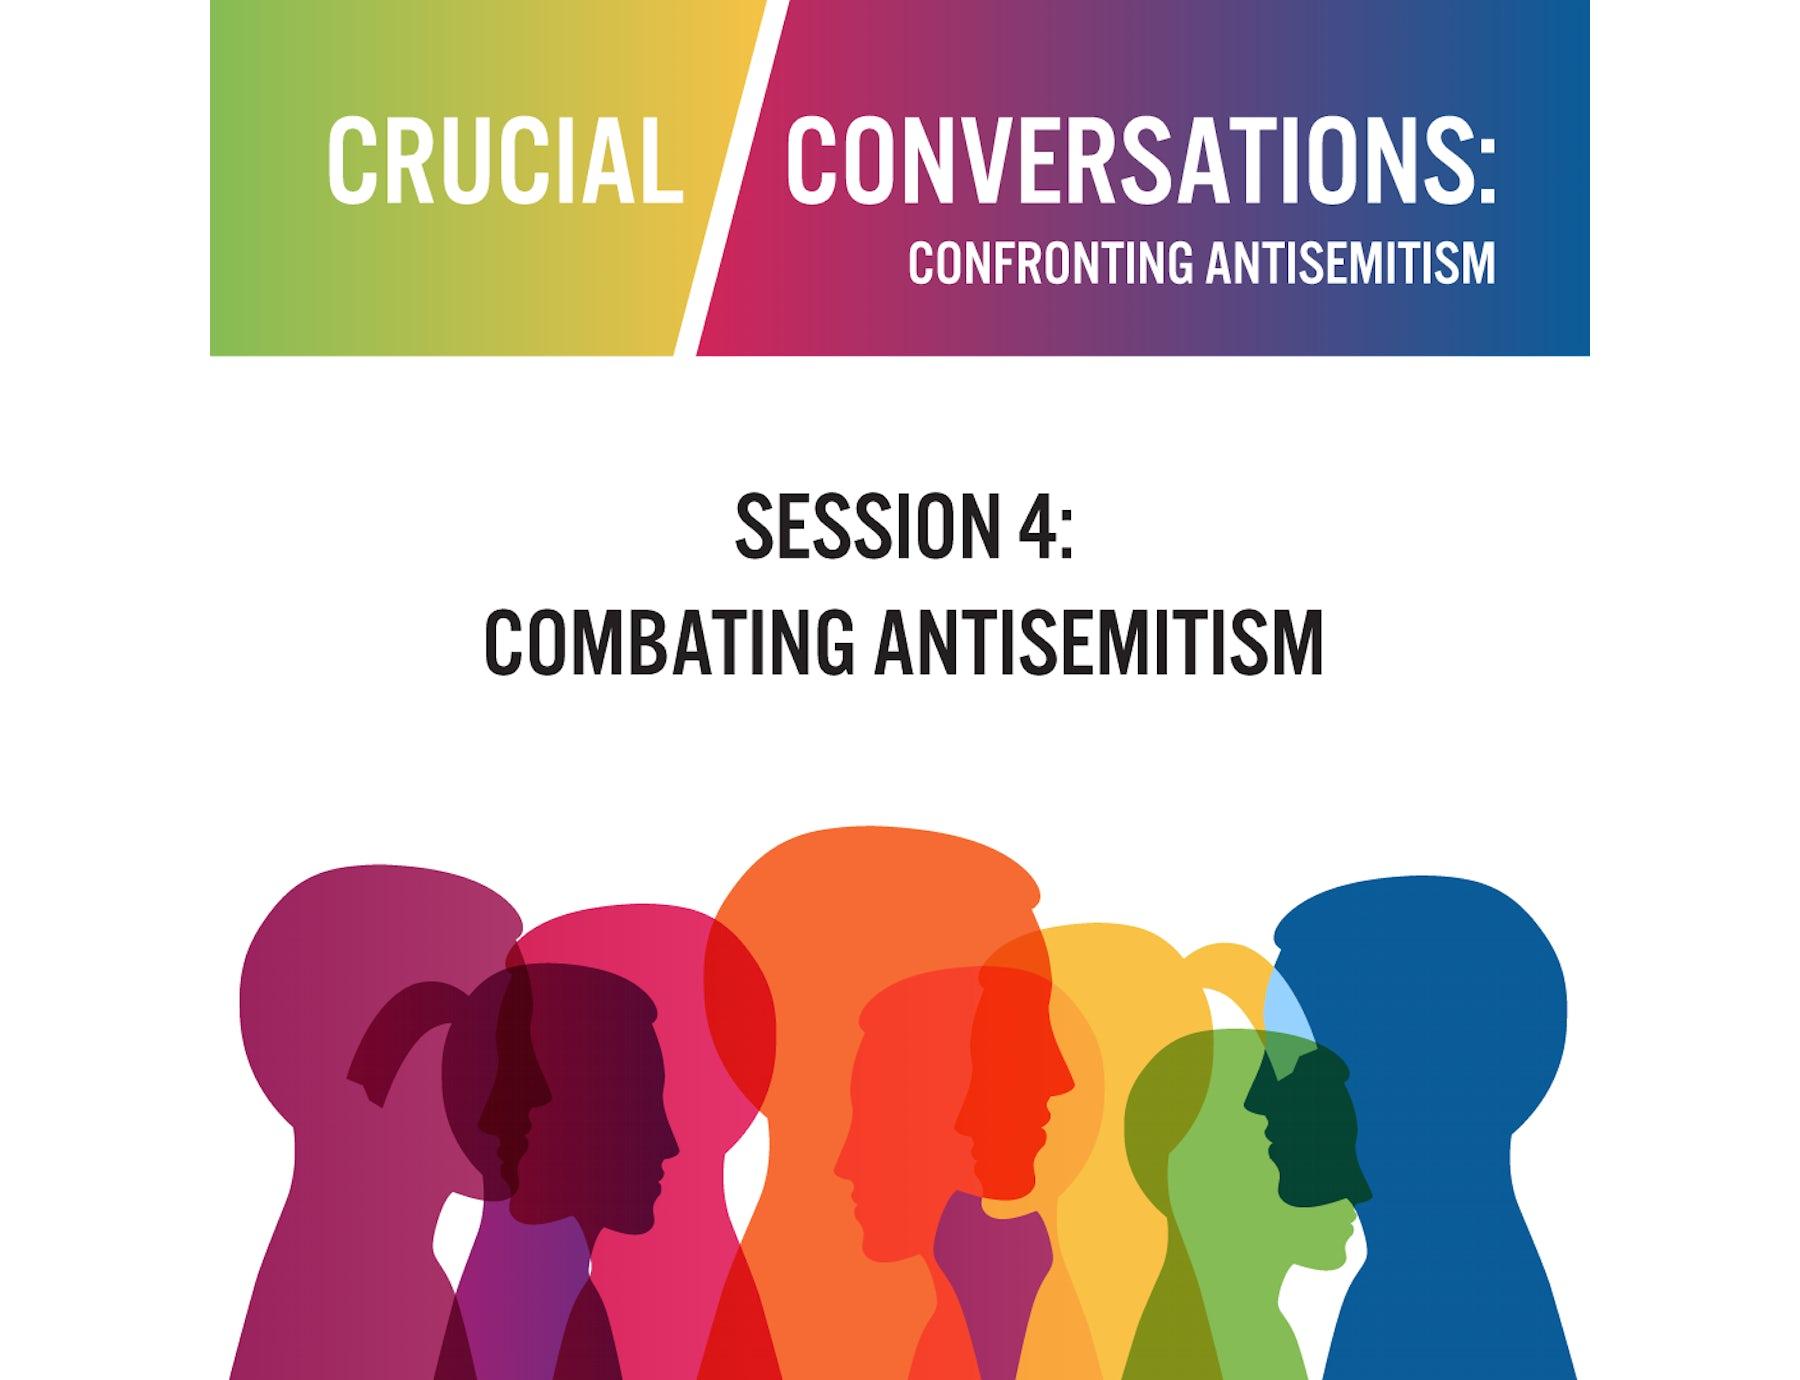 Crucial Conversations: Confronting Antisemitism – Combating Antisemitism